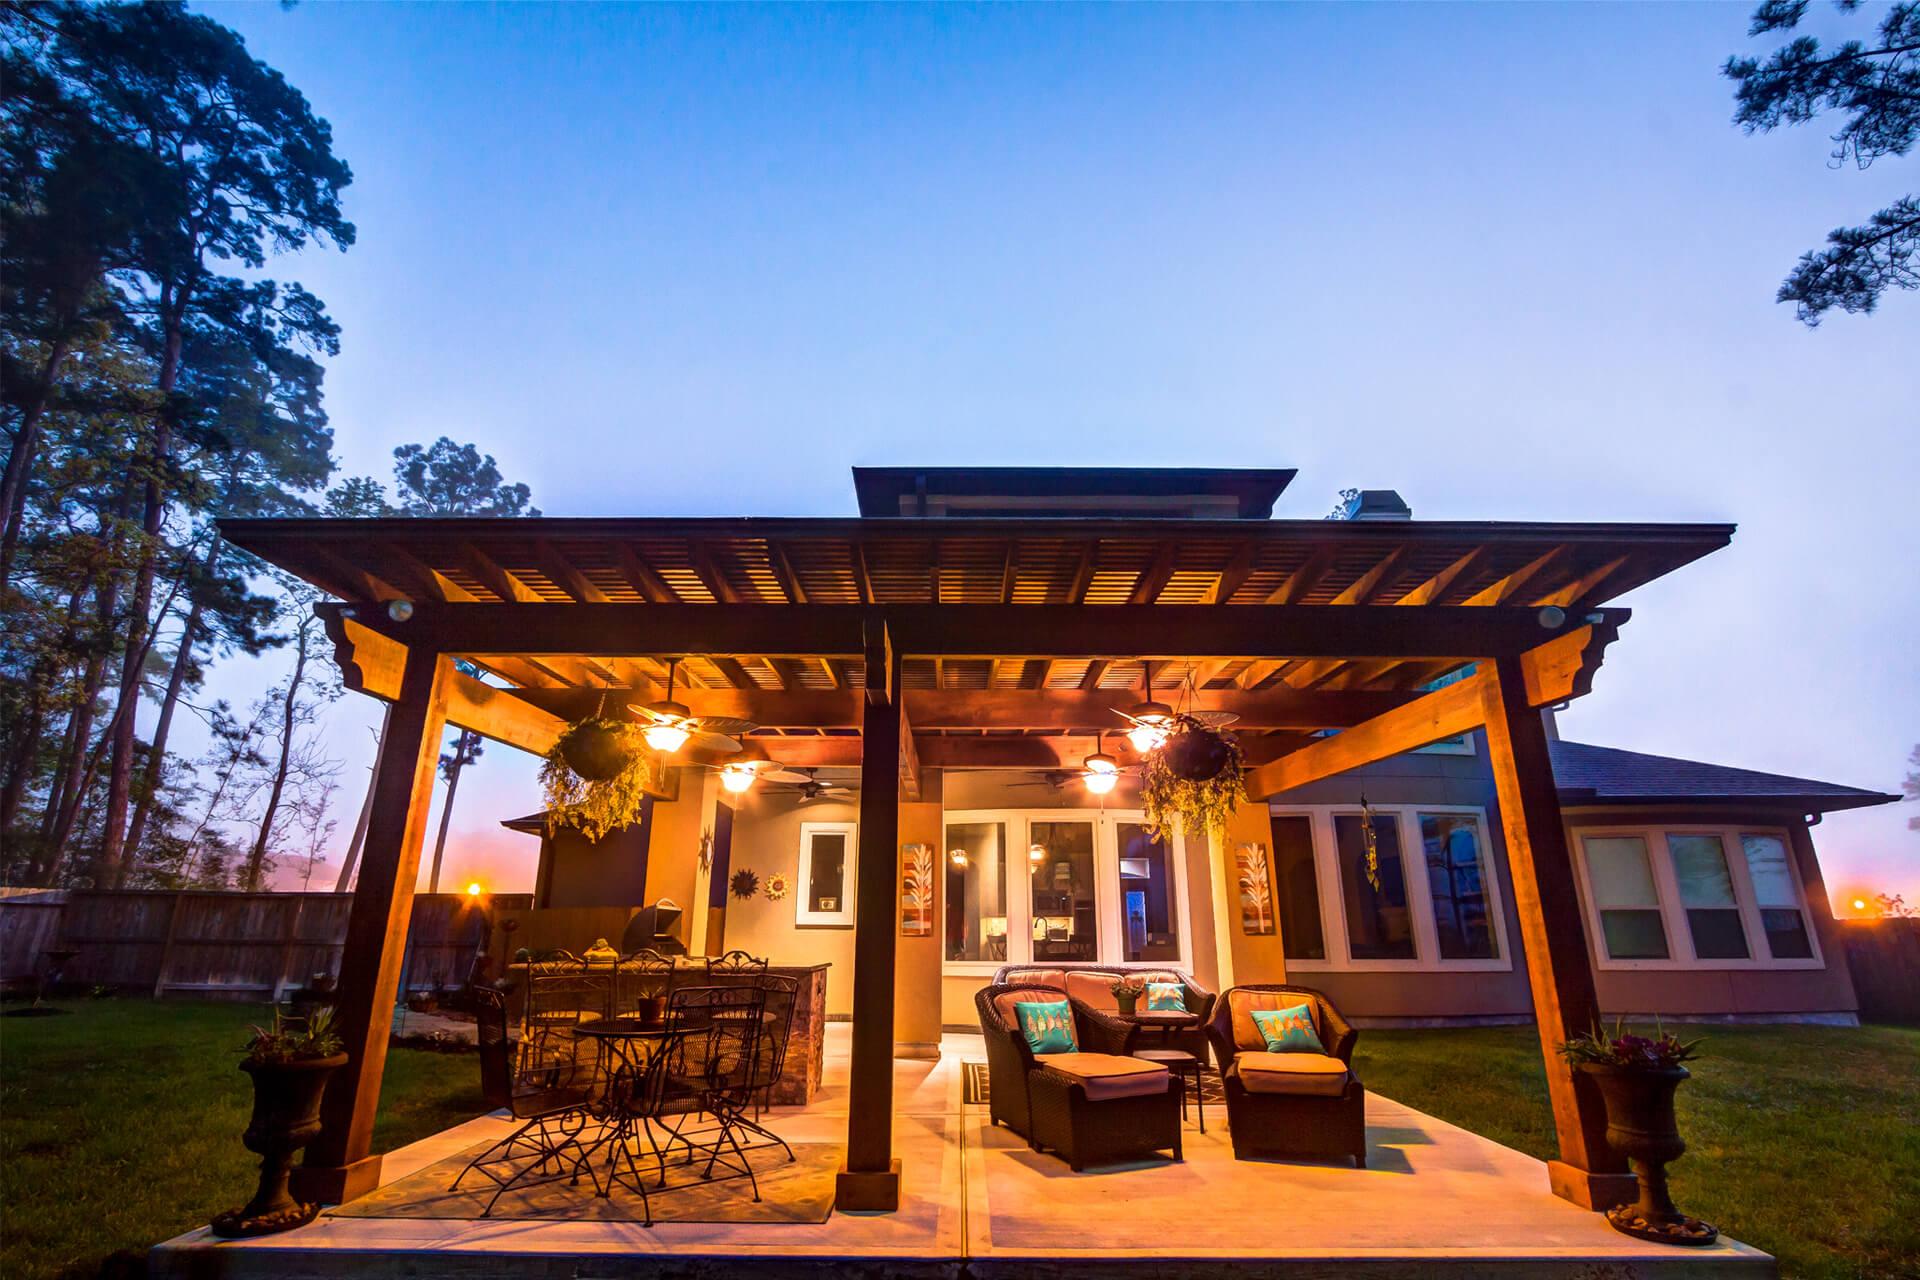 The Crescent Oaks - Custom Outdoor Pergola and custom Kitchen in Houston, Texas